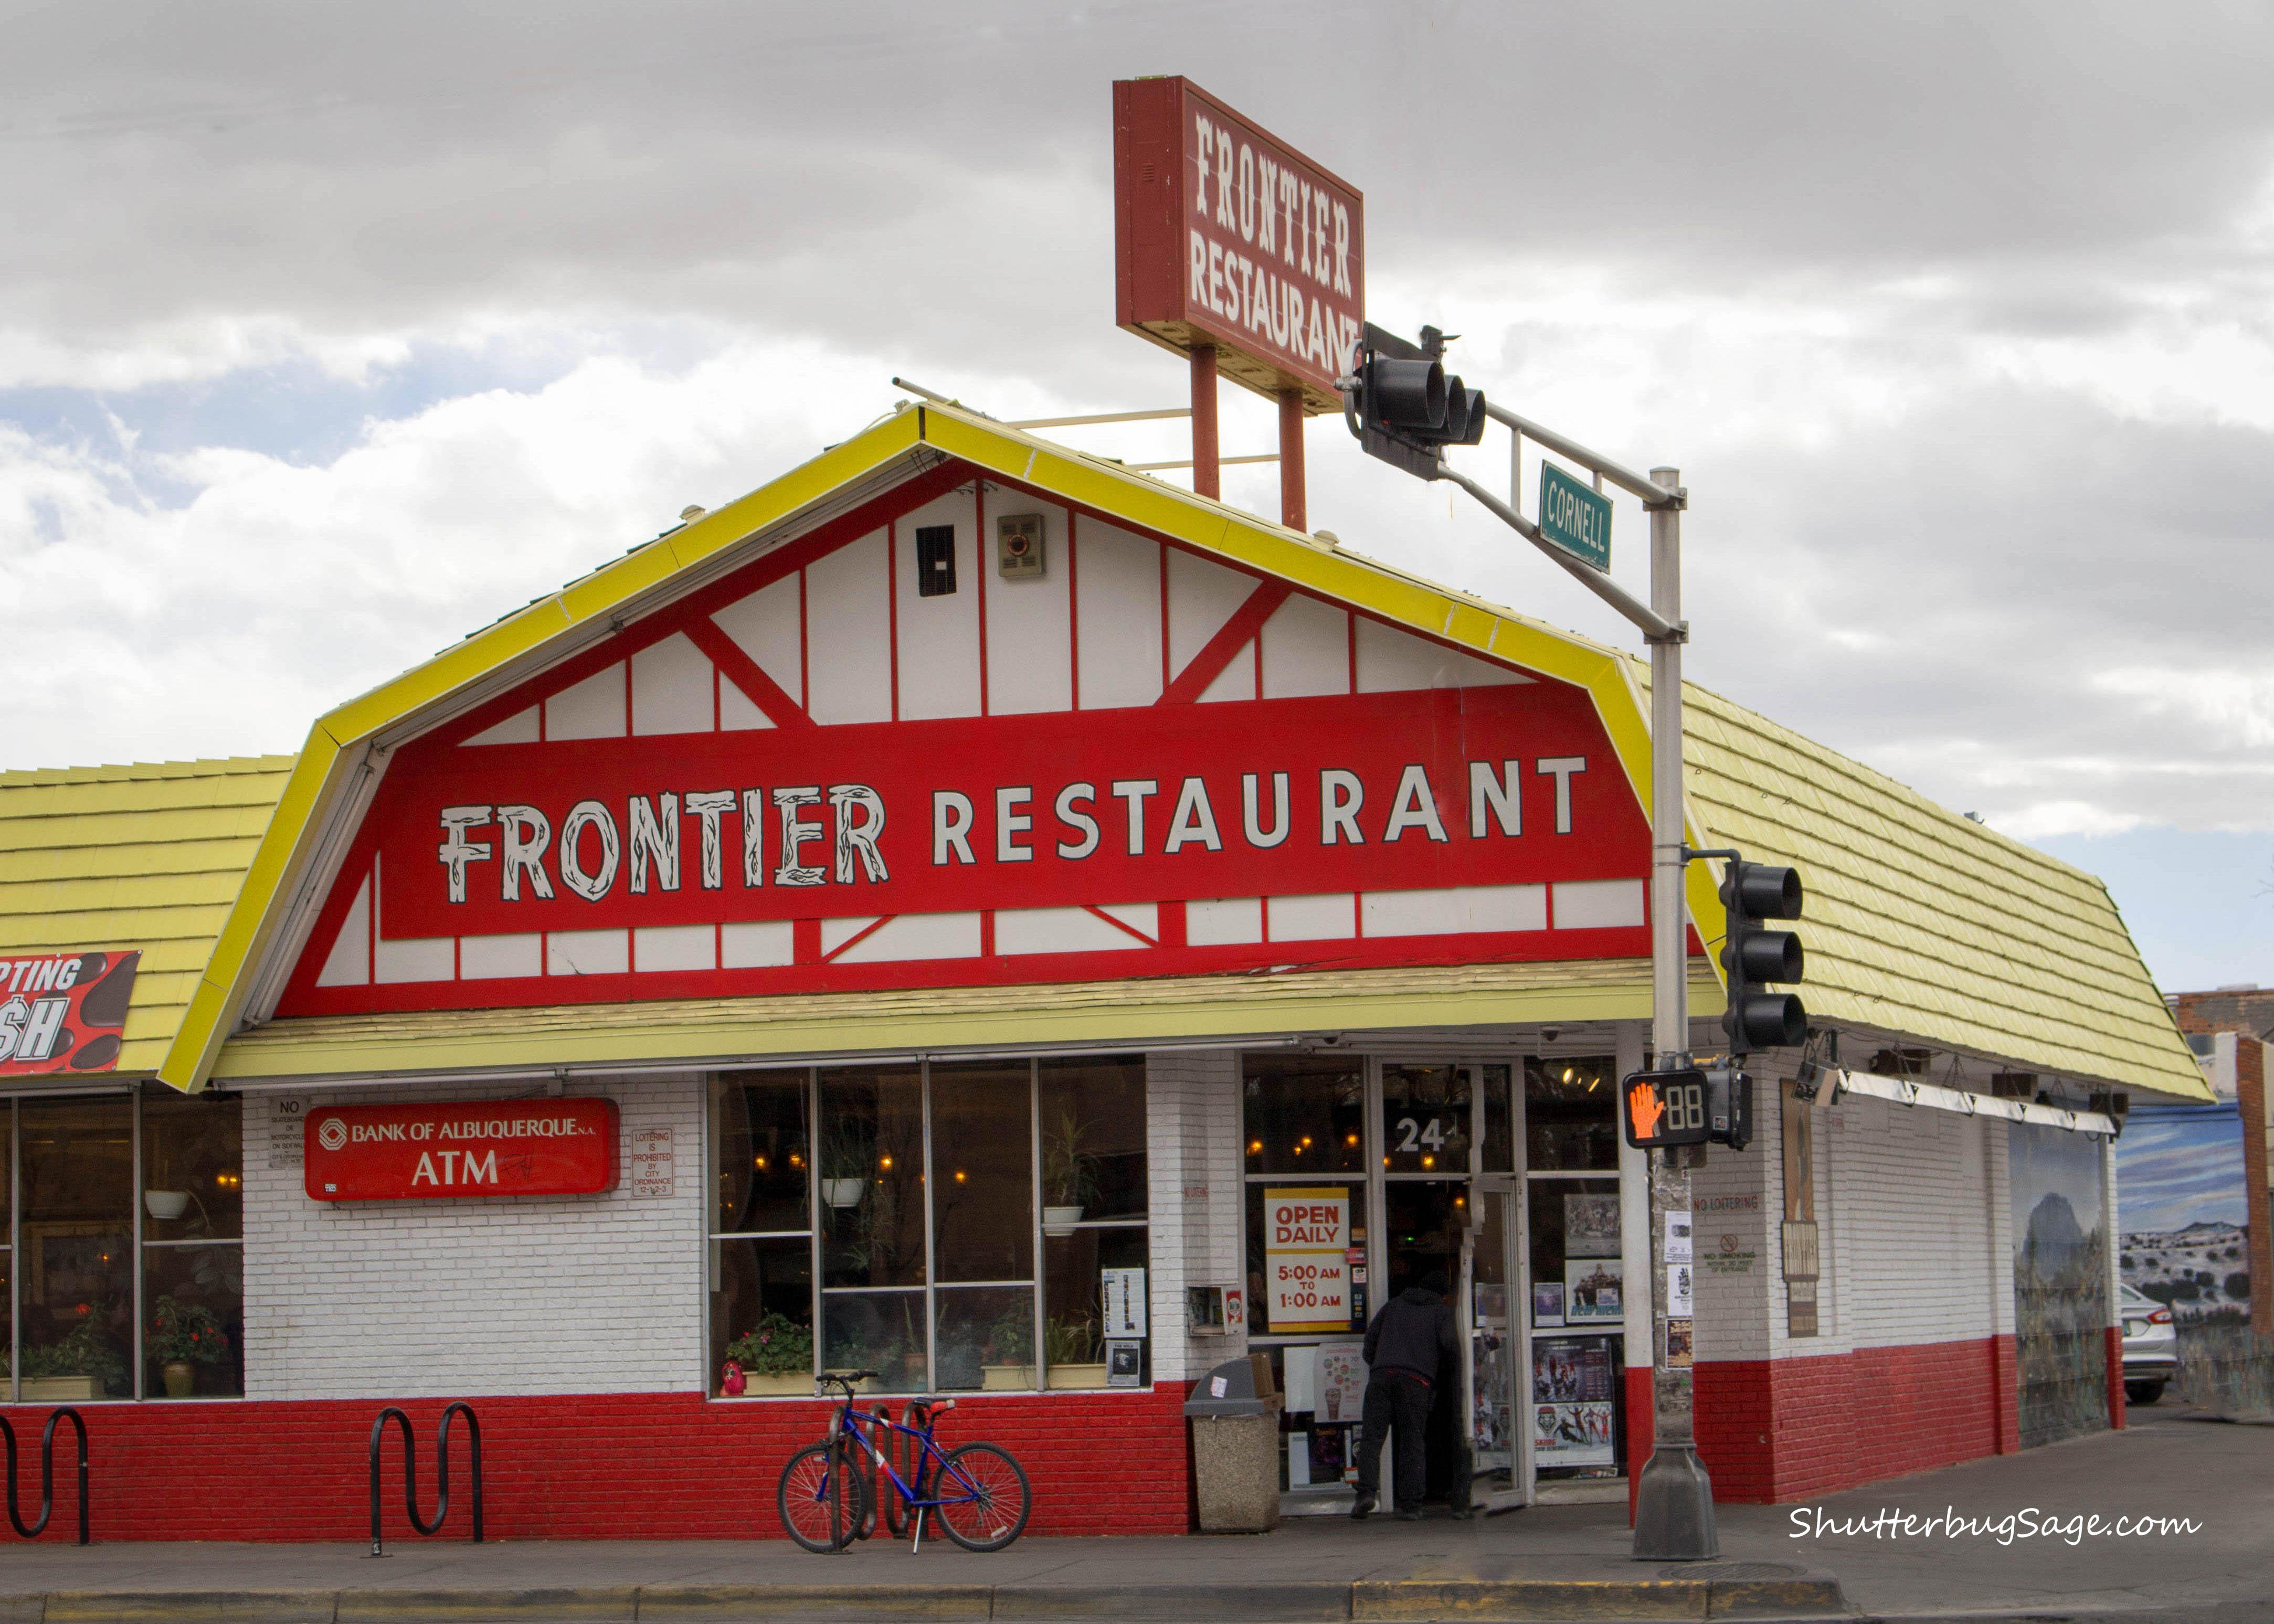 Review Frontier Restaurant Shutterbugsage Com